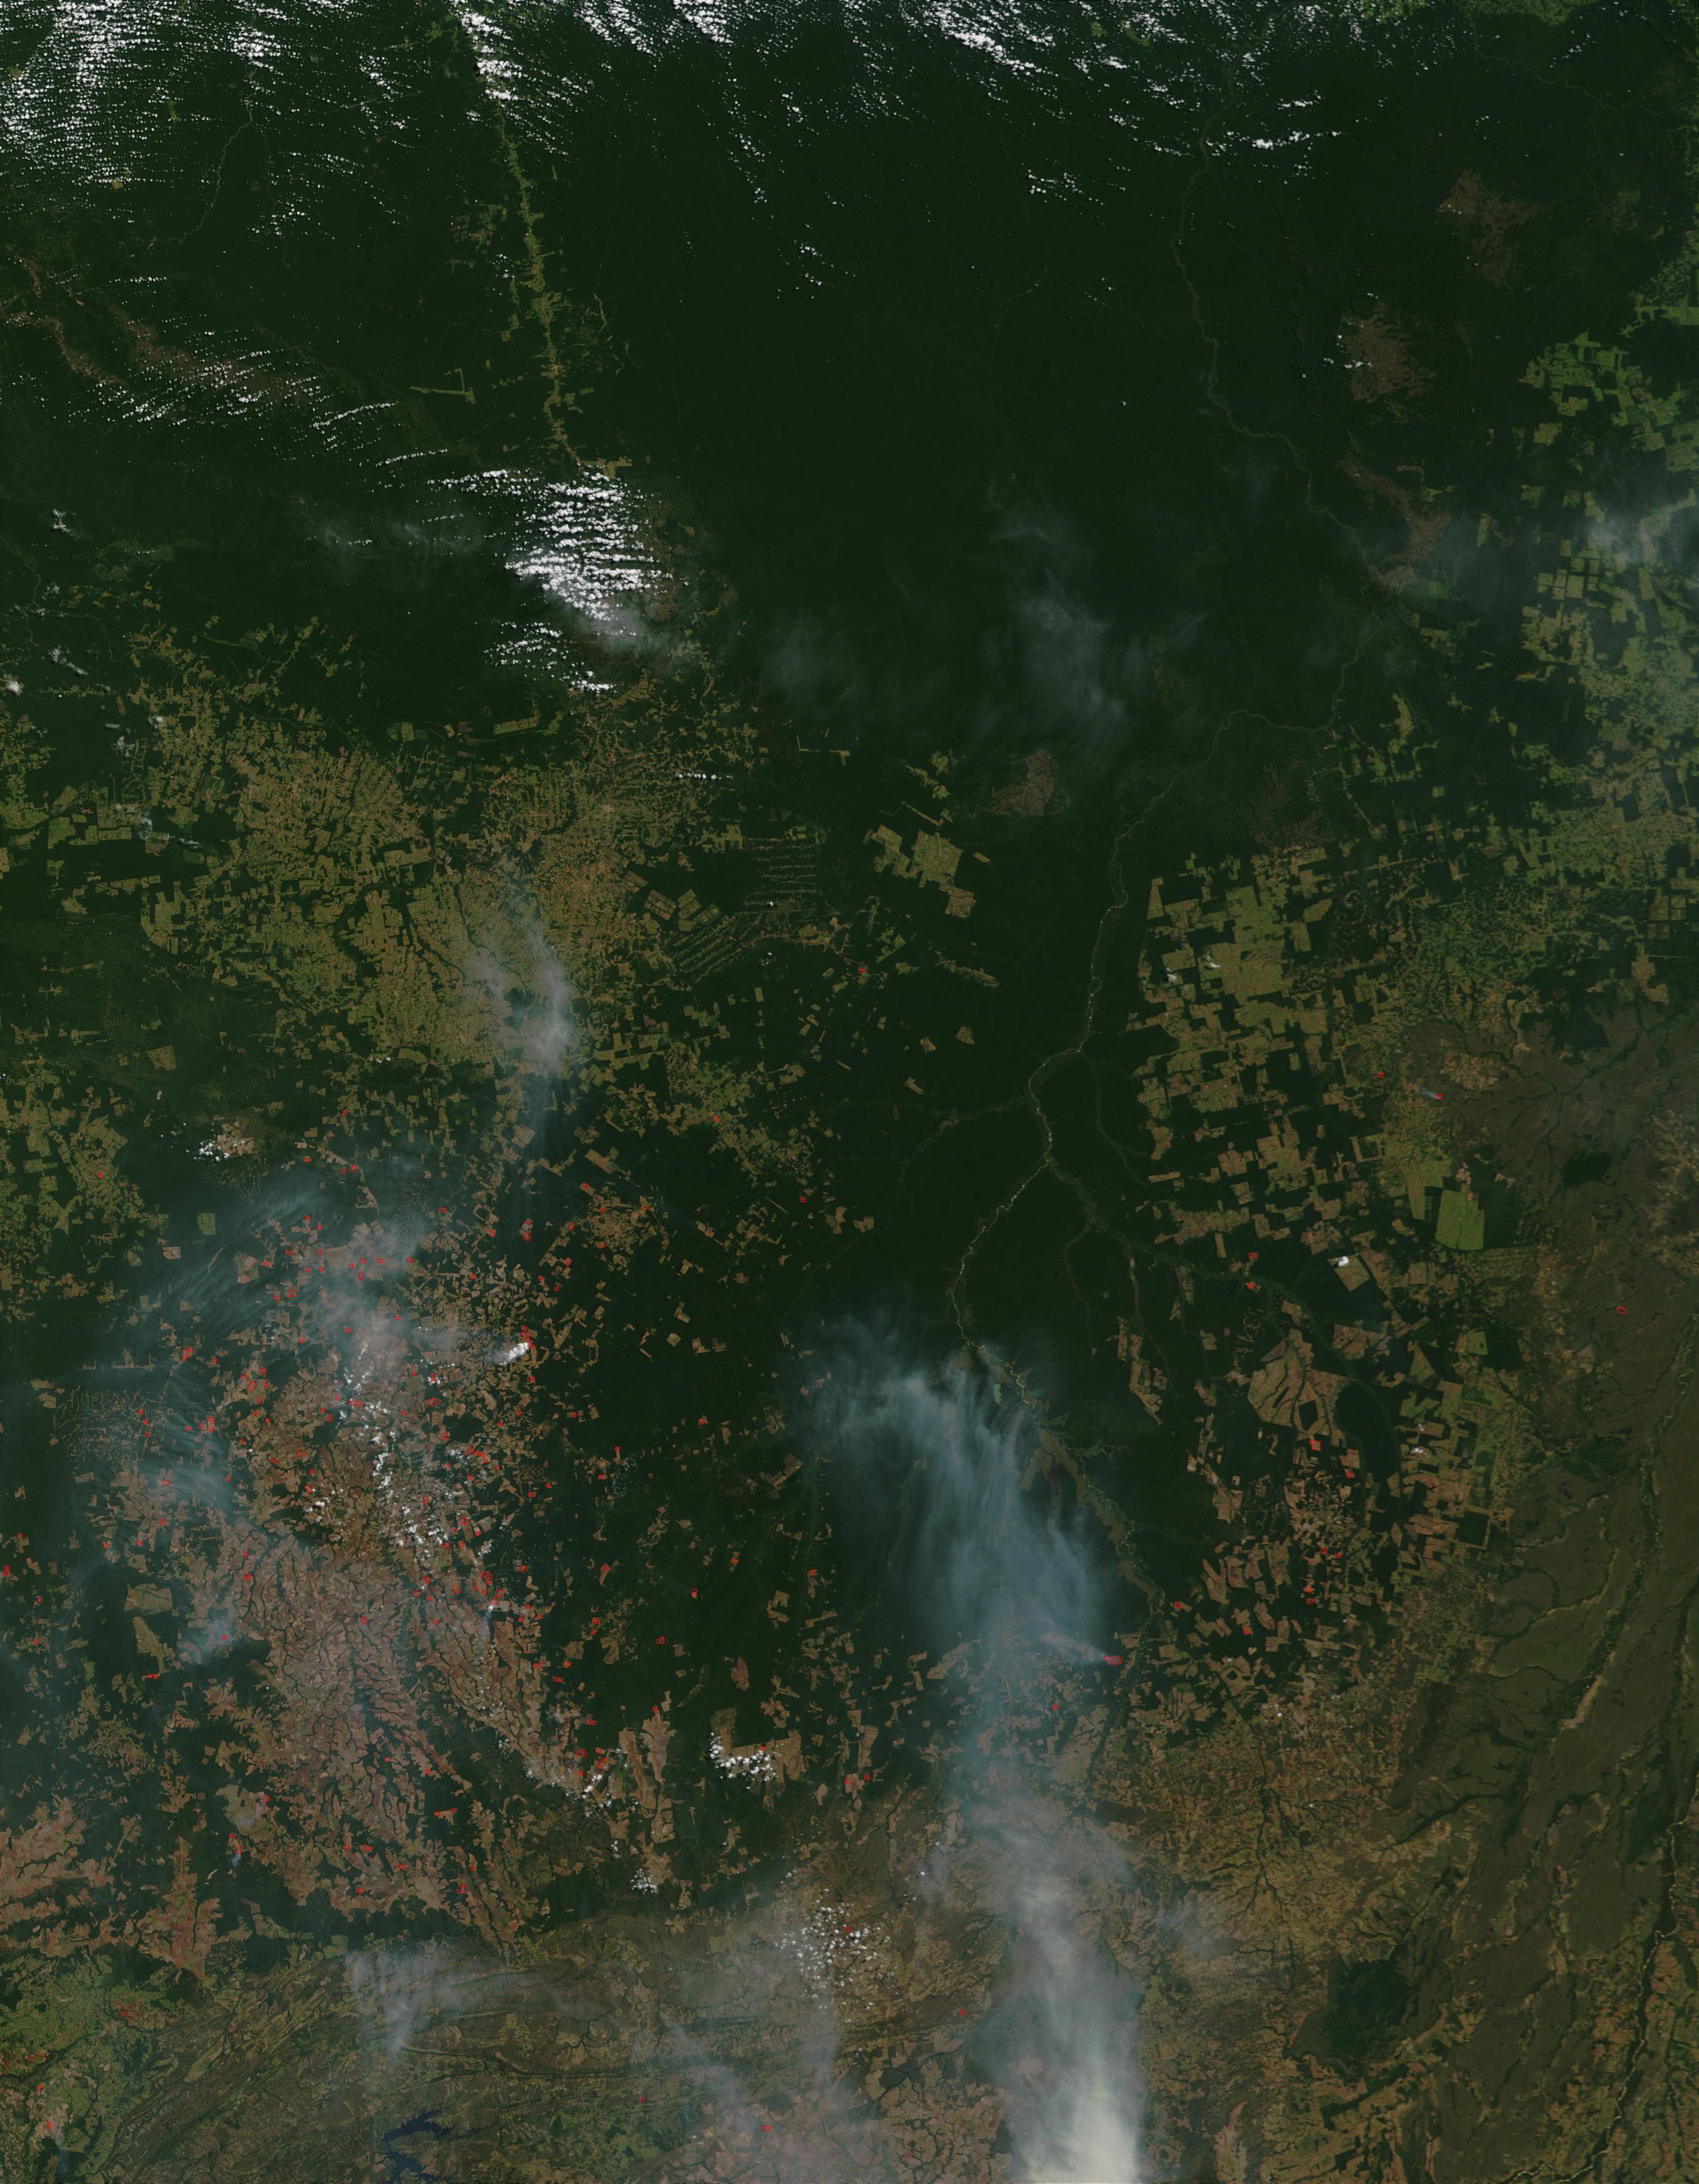 Fires and smoke around the upper Xingu River, Brazil